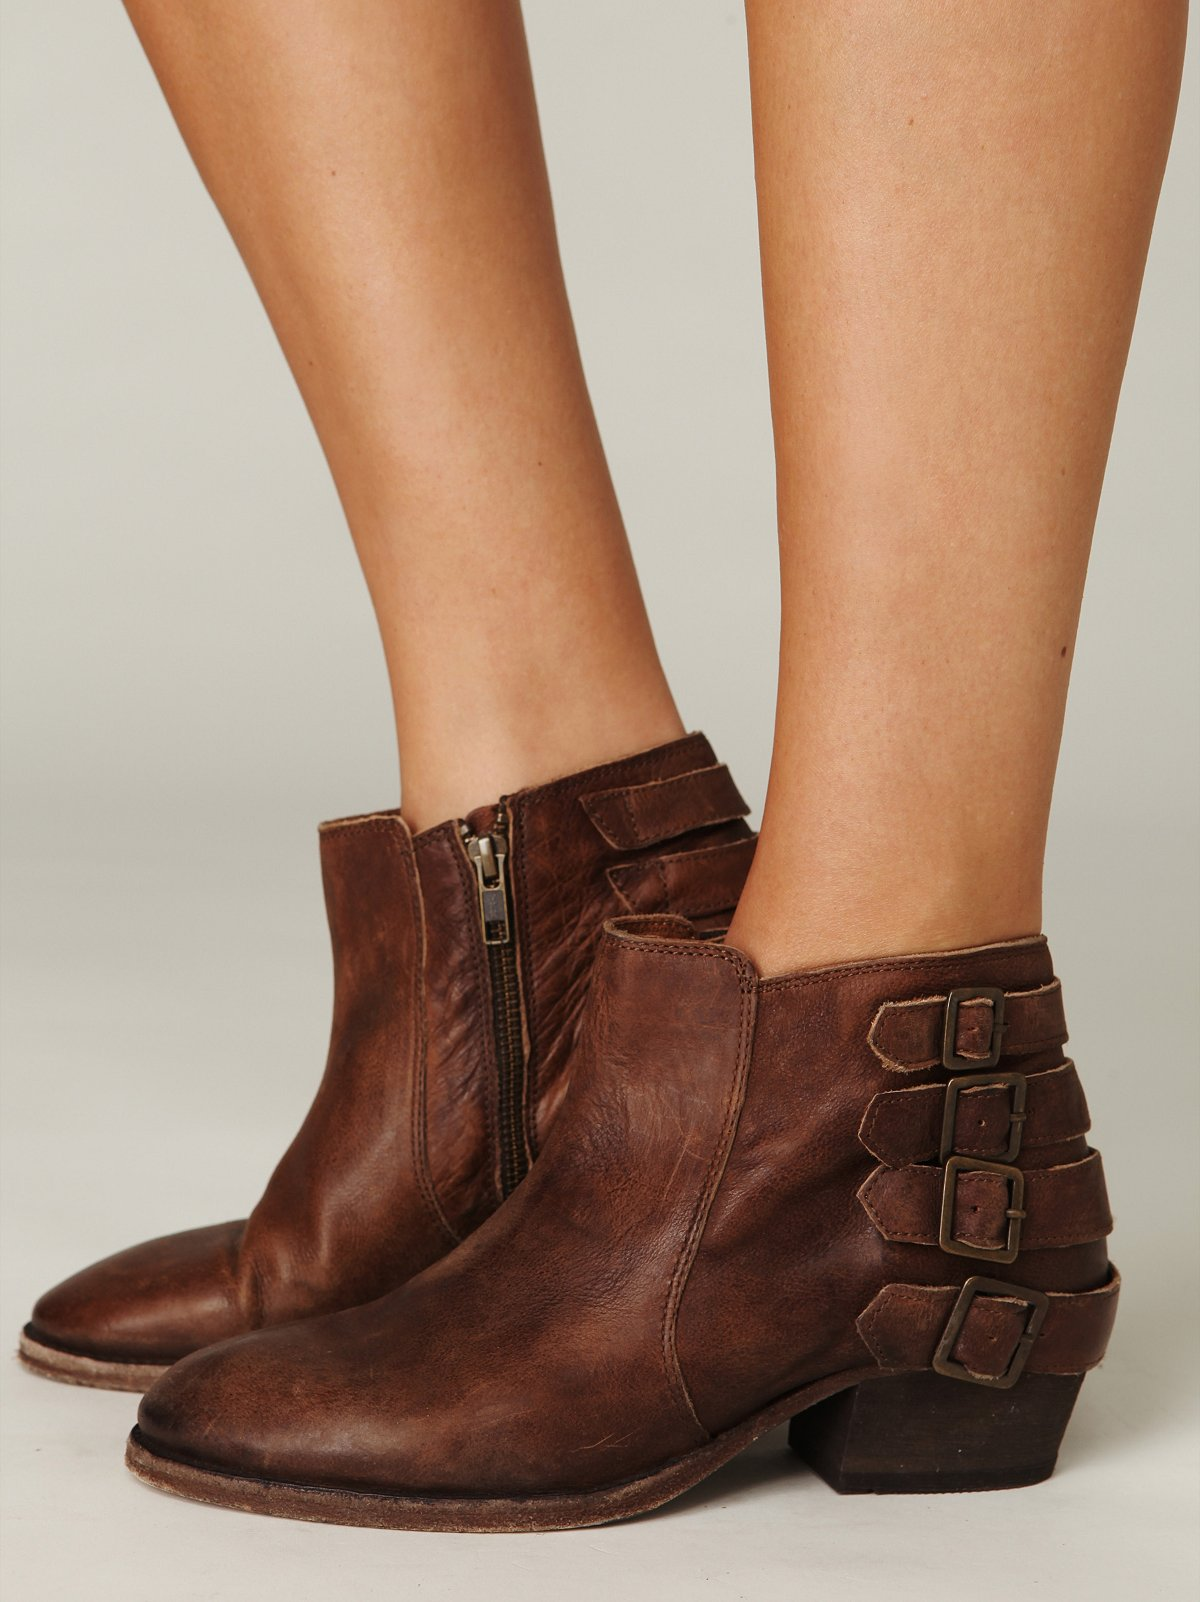 Encke Buckle Boot